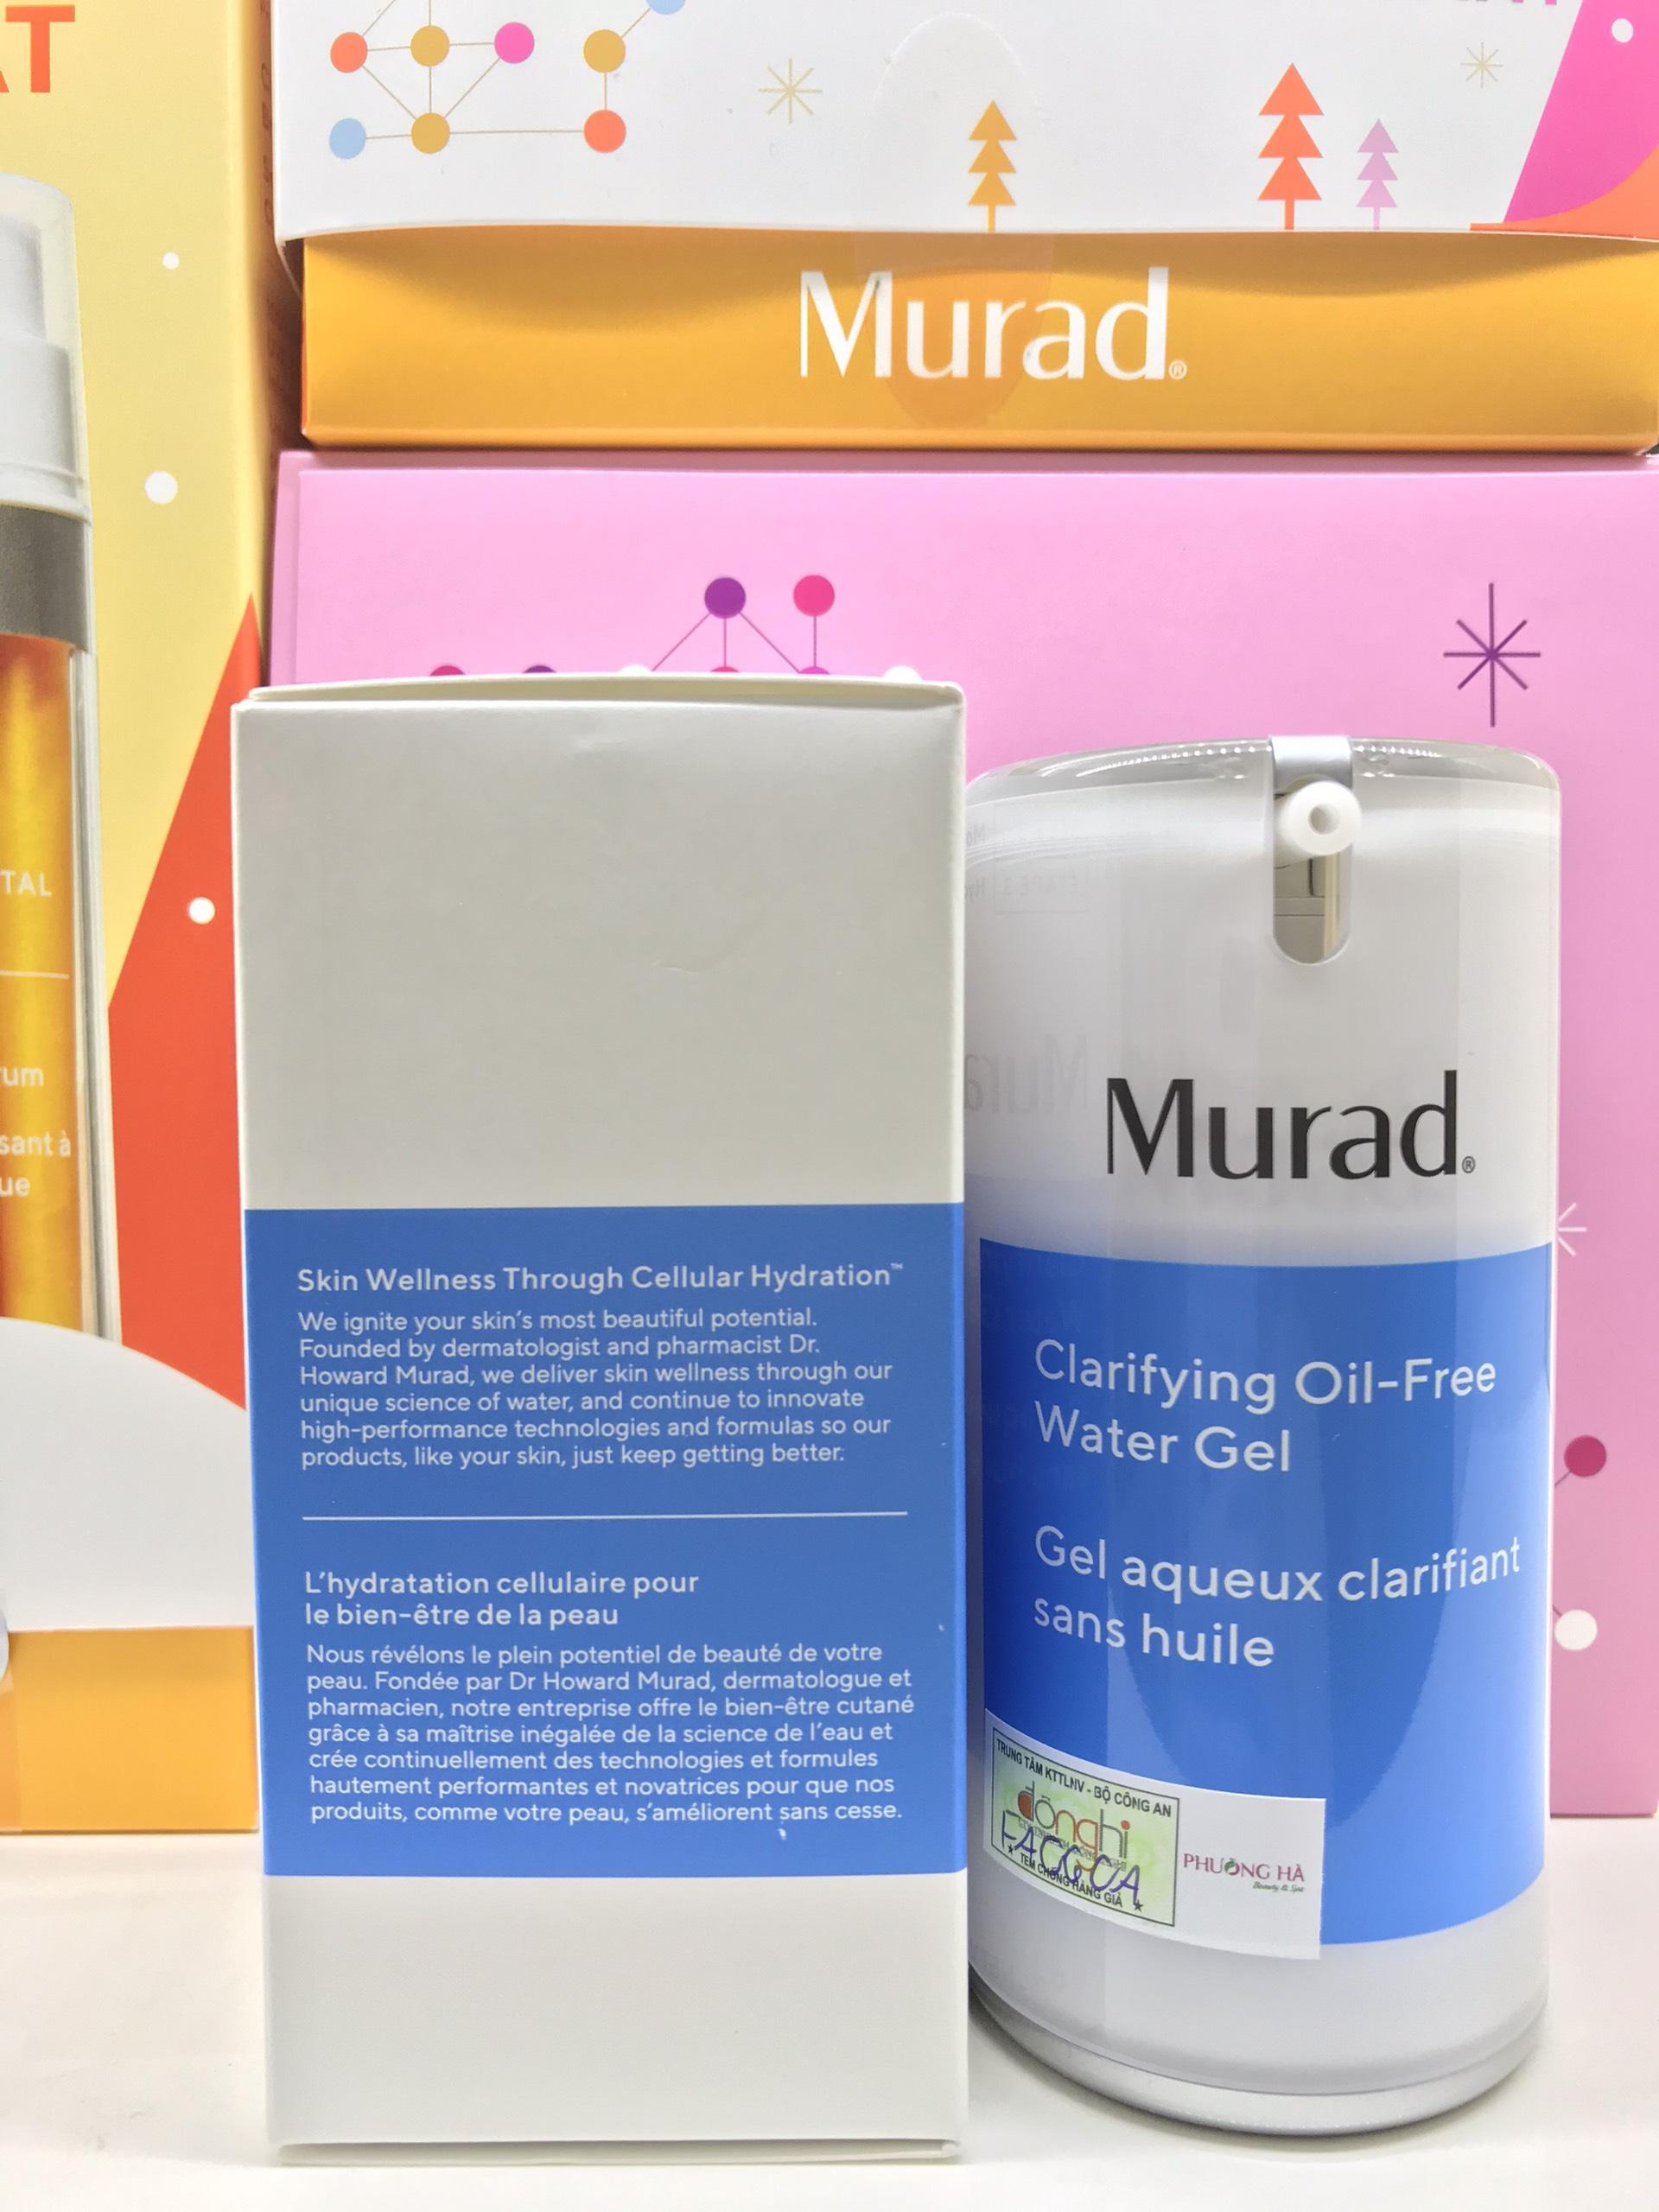 [KHUYẾN MÃI] Mua Gel dưỡng cách ly vi khuẩn Murad Clarifying Oil-Free Water Gel TẶNG Gel giảm mụn 4 giờ Murad Rapid Relief Acne Spot Treatment